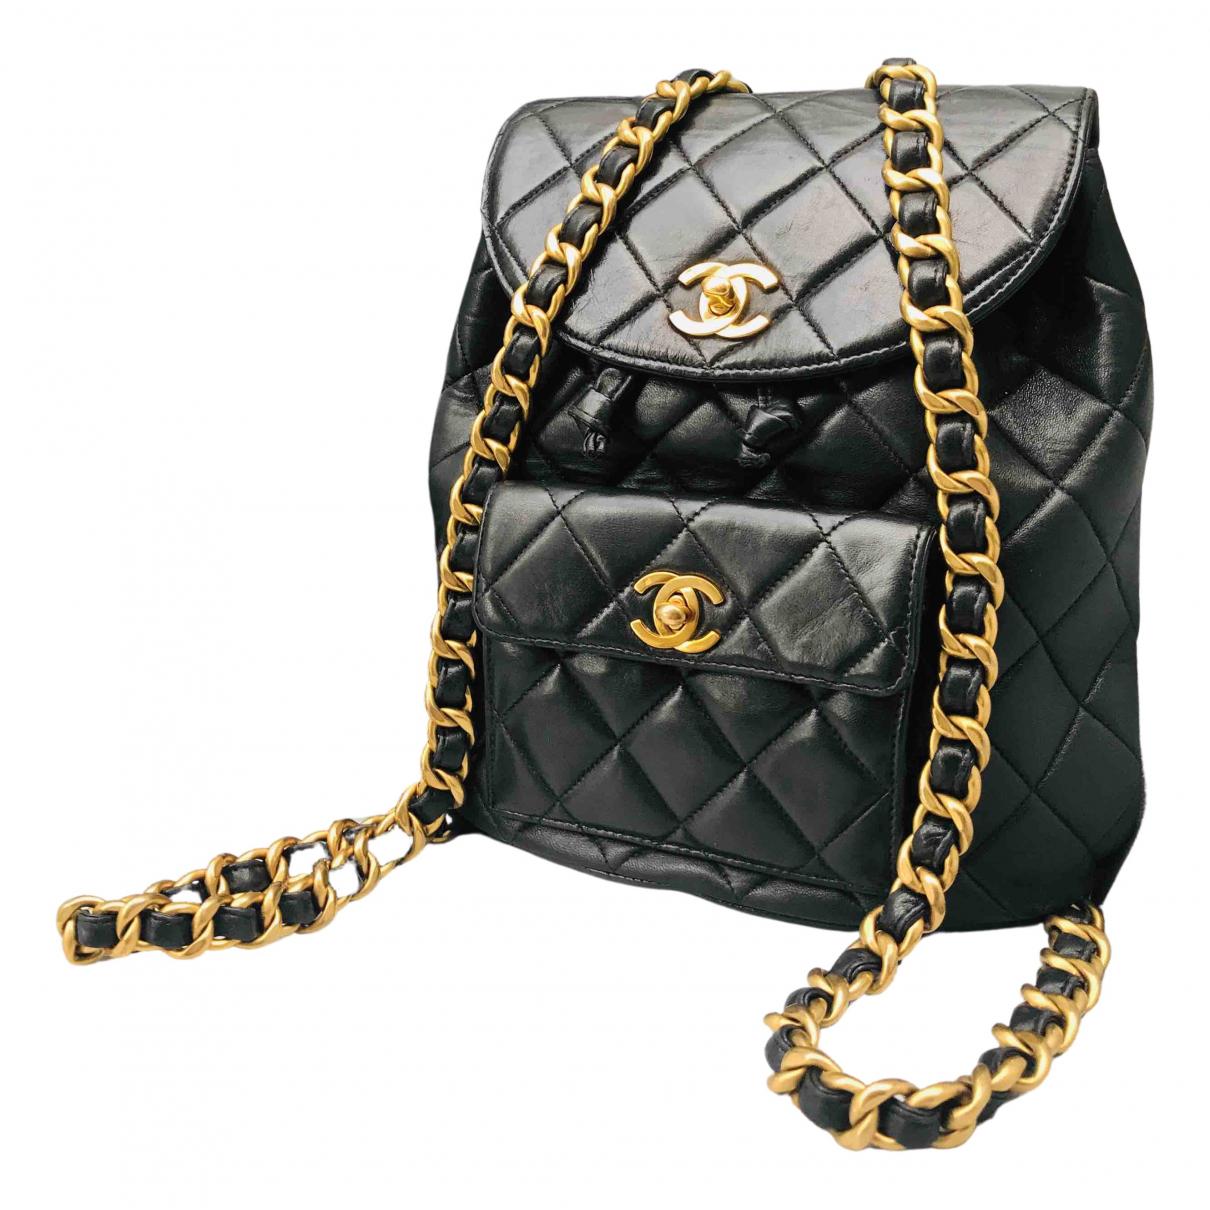 Mochila Duma de Cuero Chanel